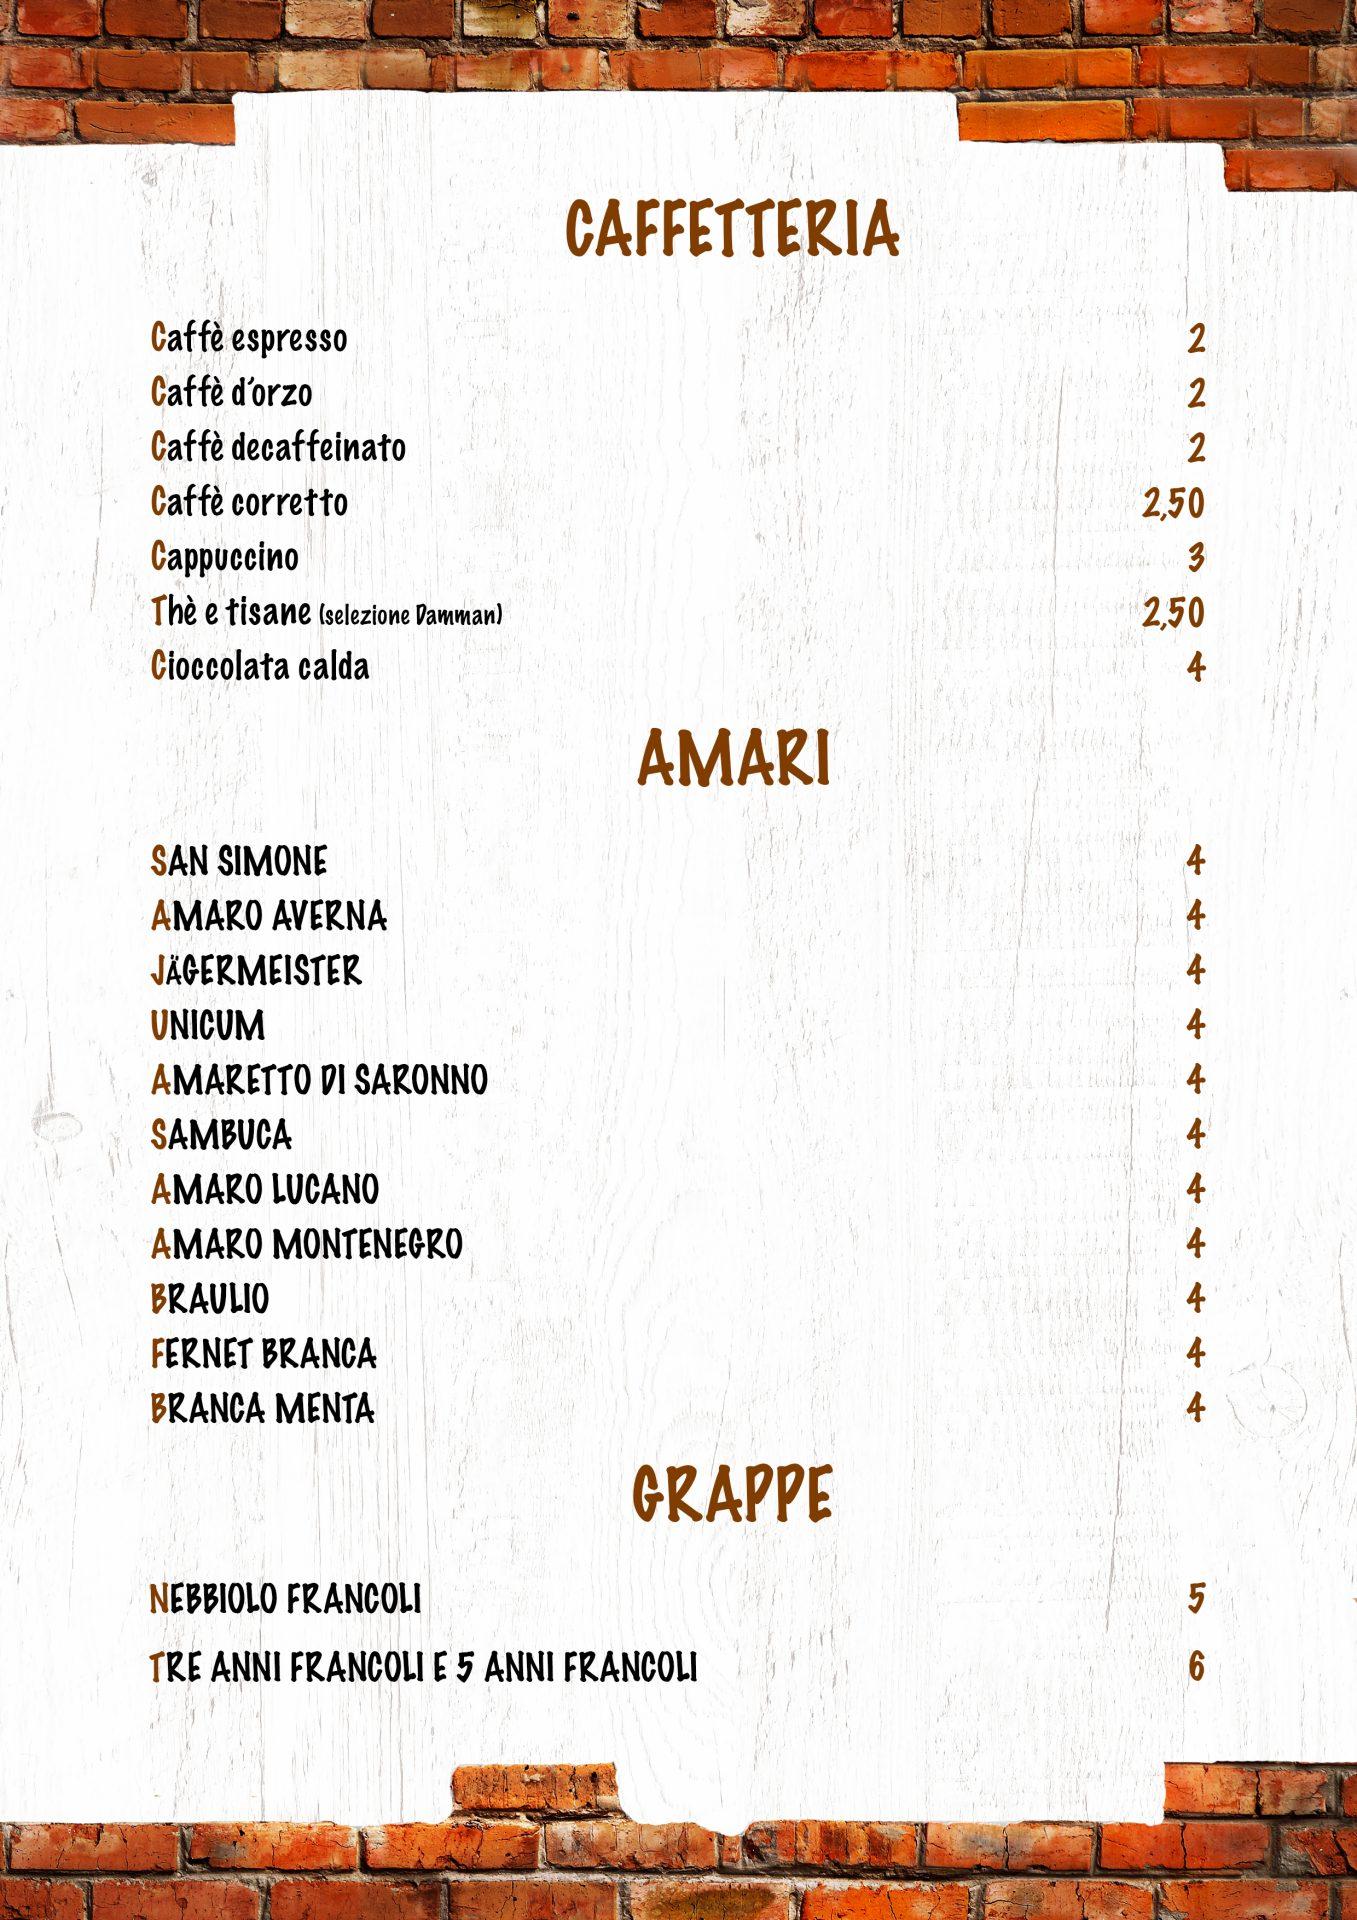 CAFFETTERIA e AMARI menù casale 93-18